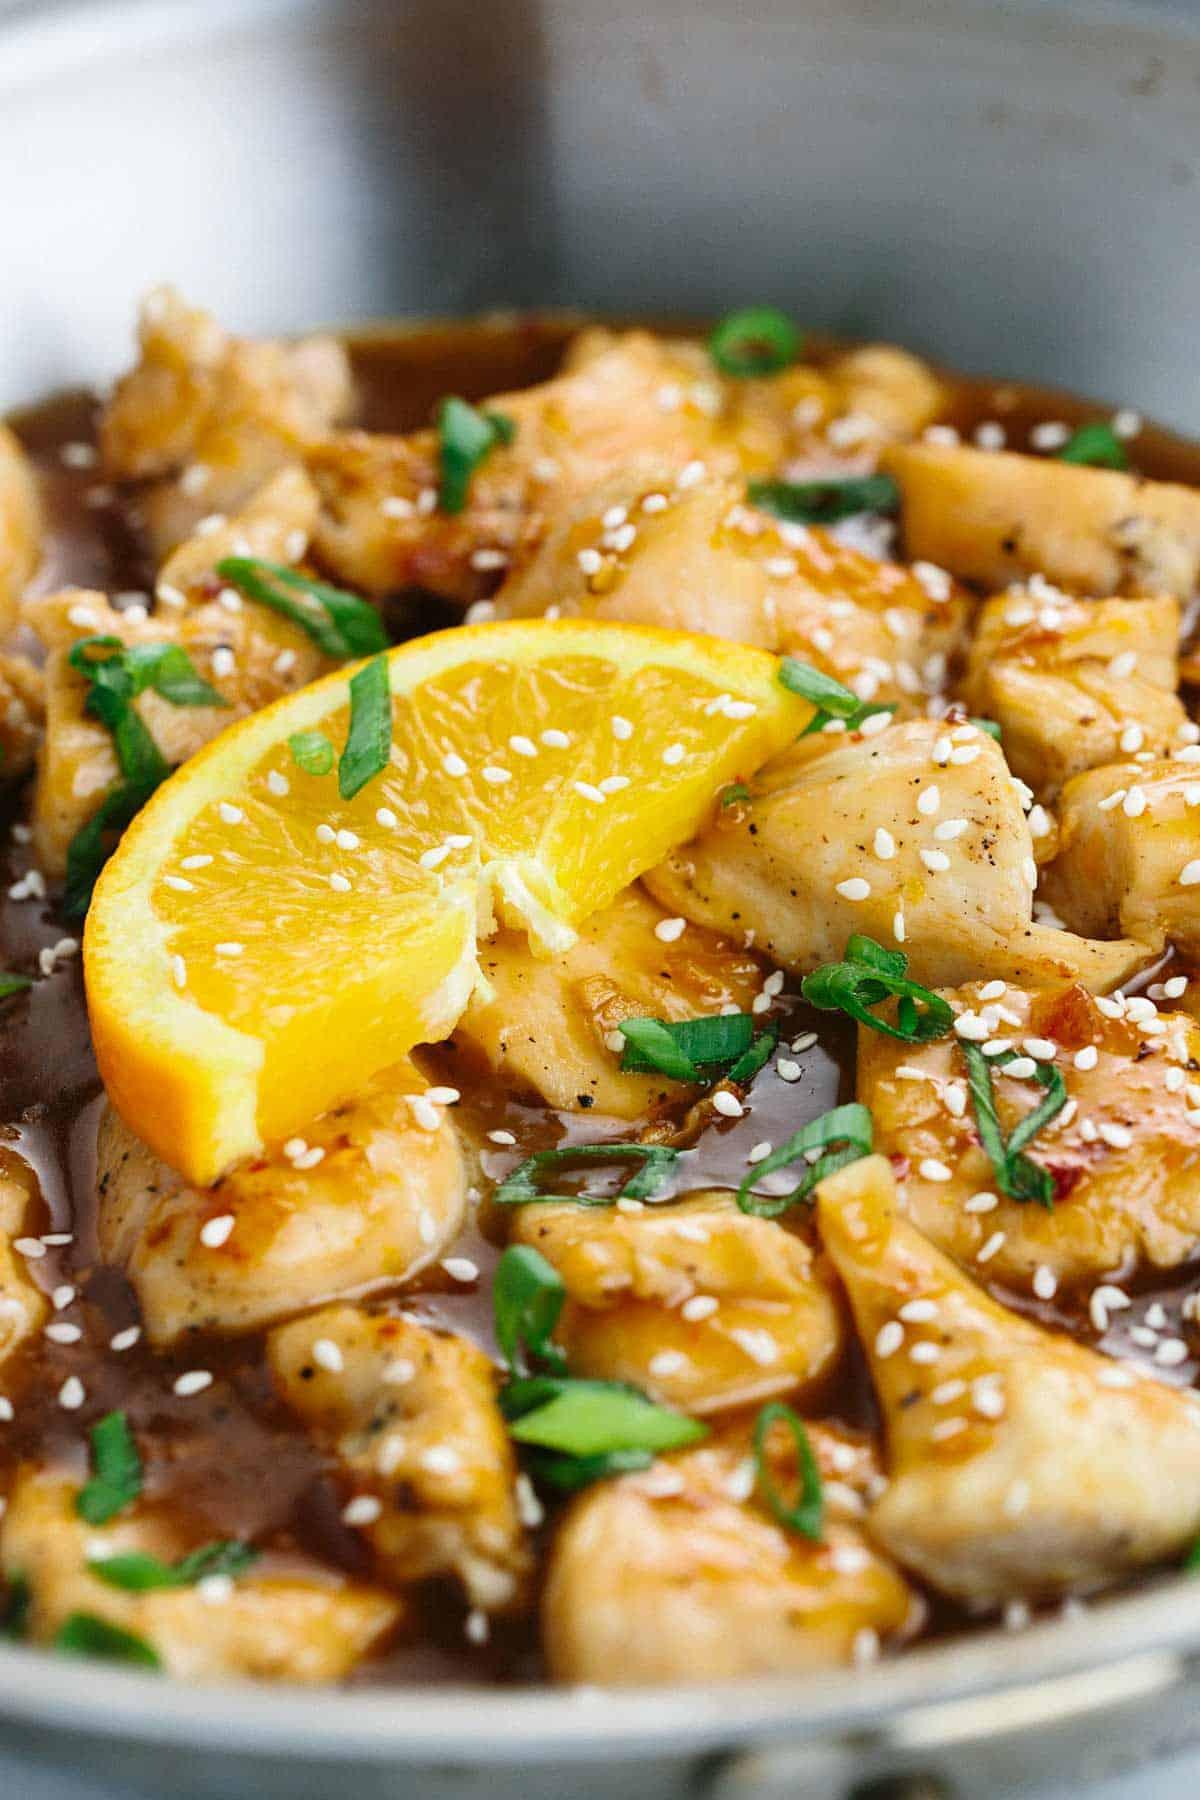 Healthier one pan chinese orange chicken recipe jessica gavin slice of orange sitting on top of chicken with sesame seeds in a pan forumfinder Gallery